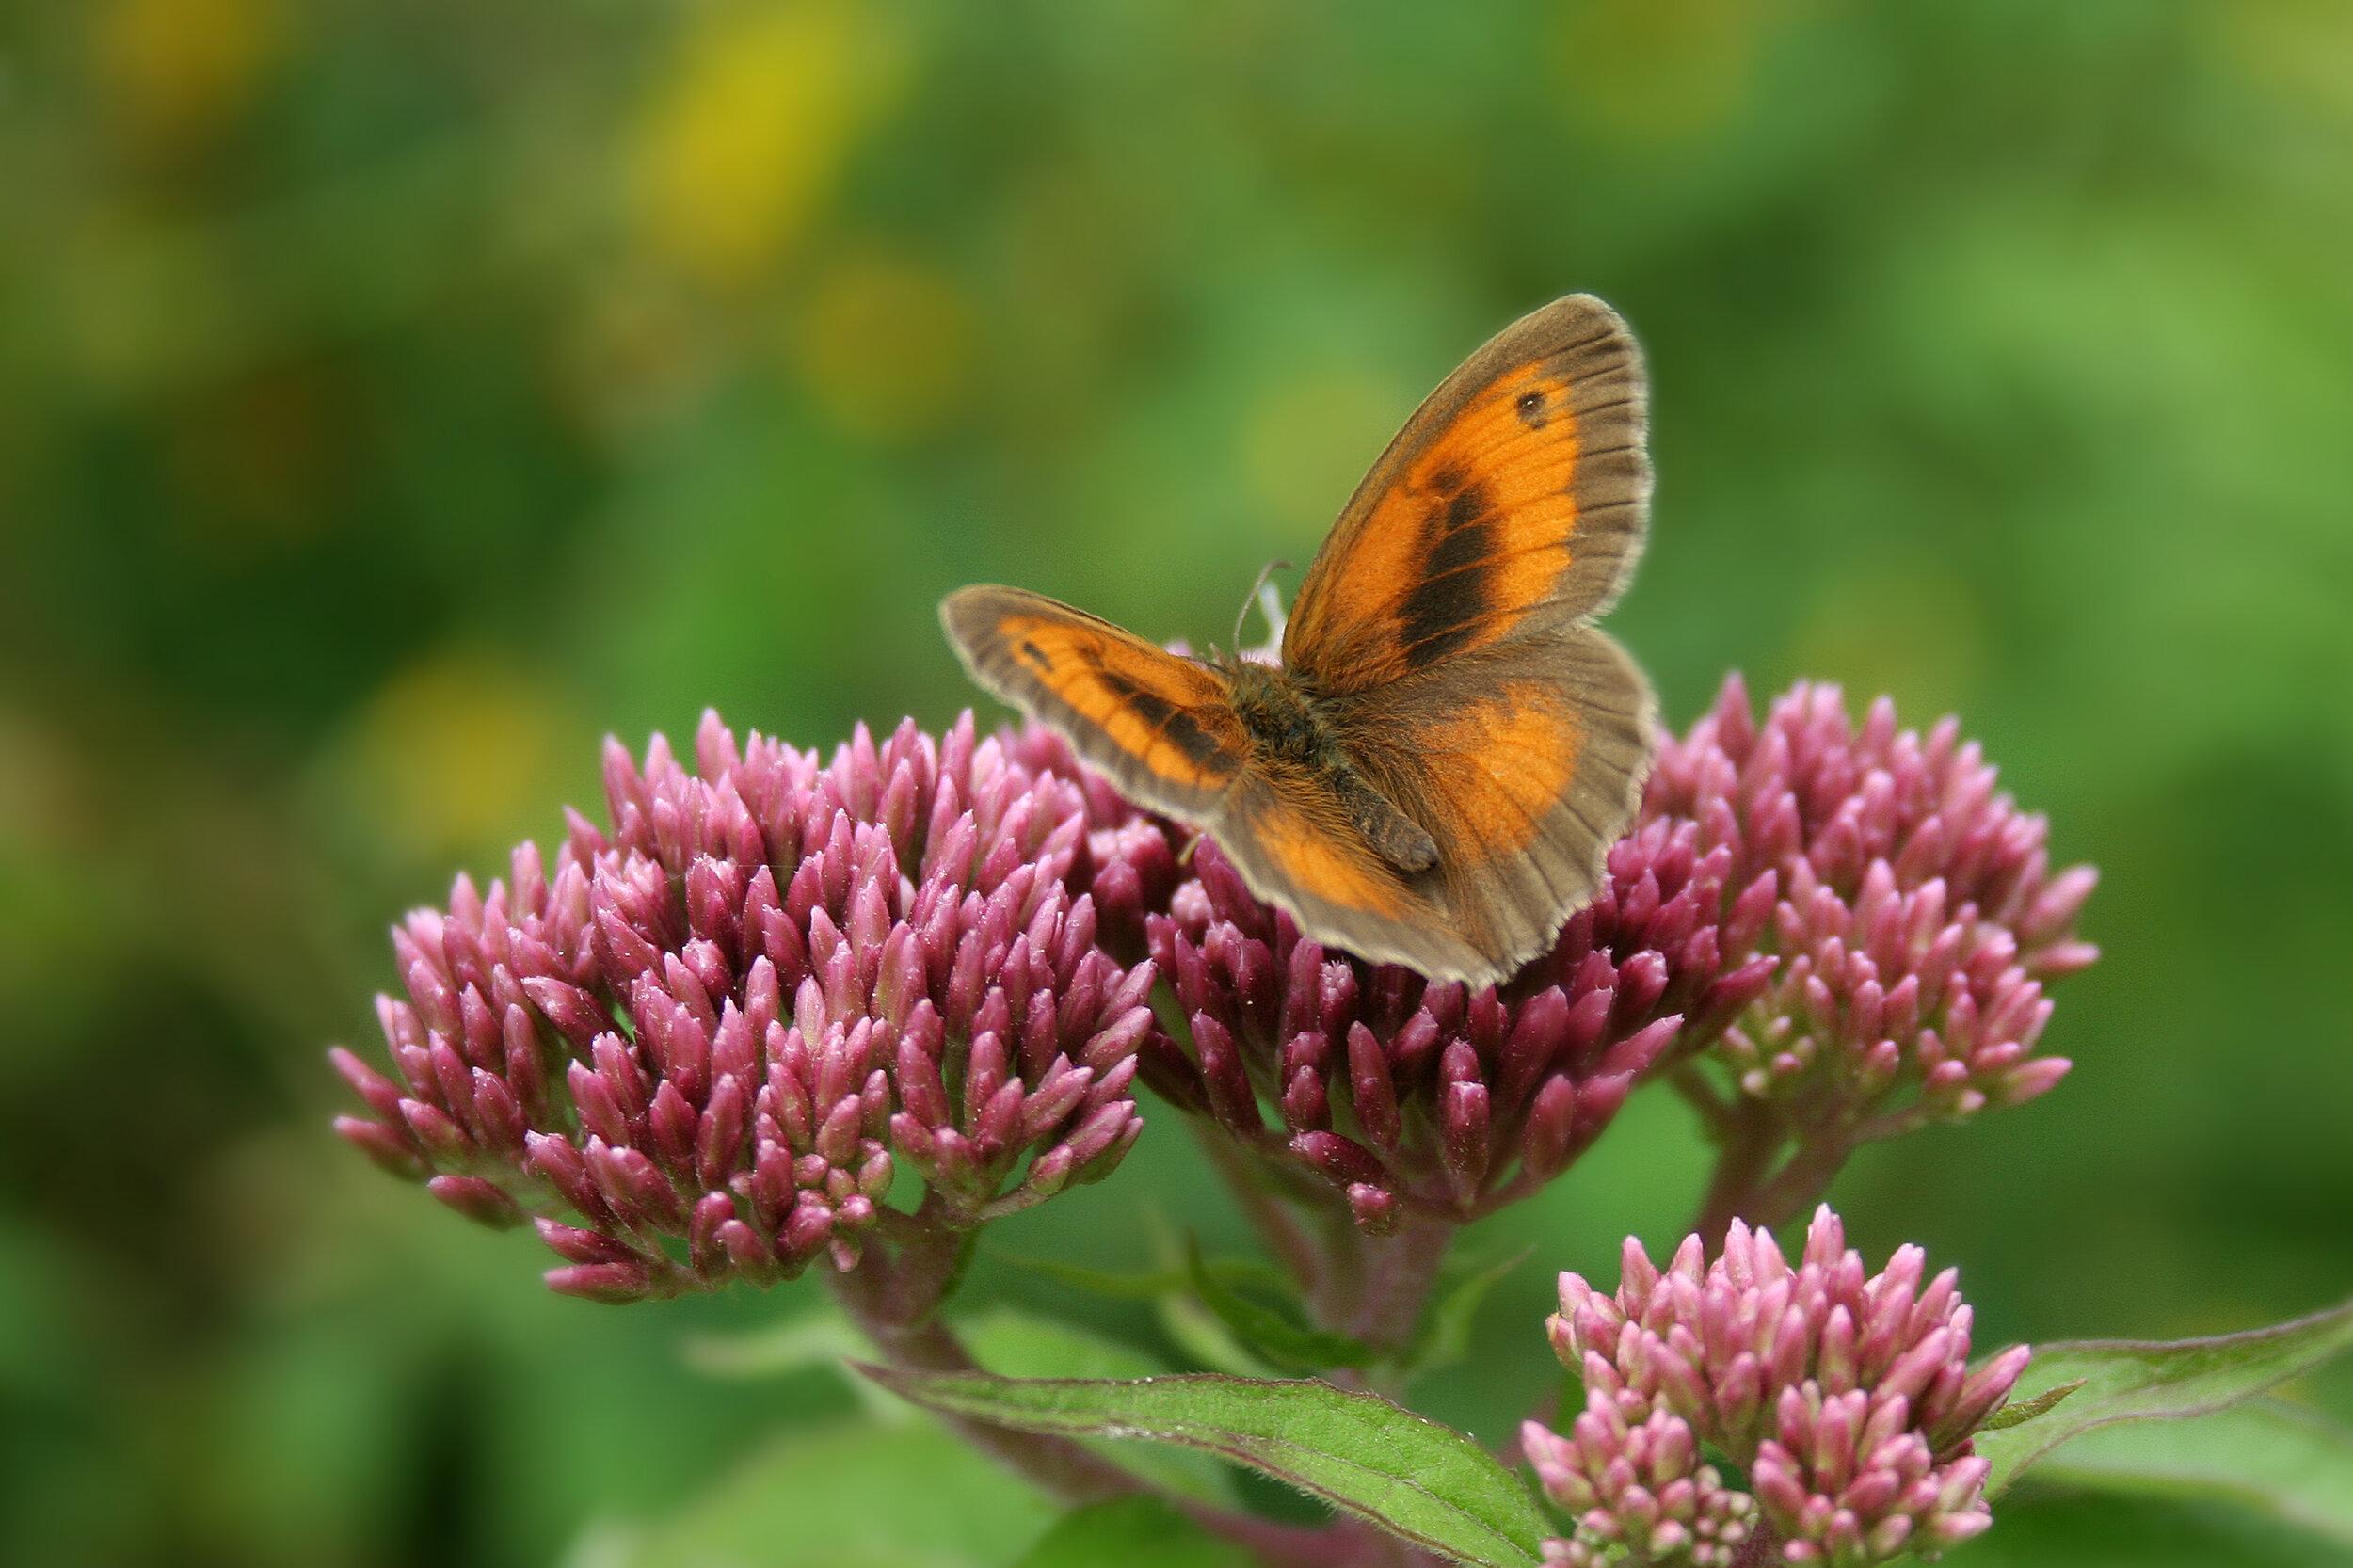 Gatekeeper butterfly, Tortington